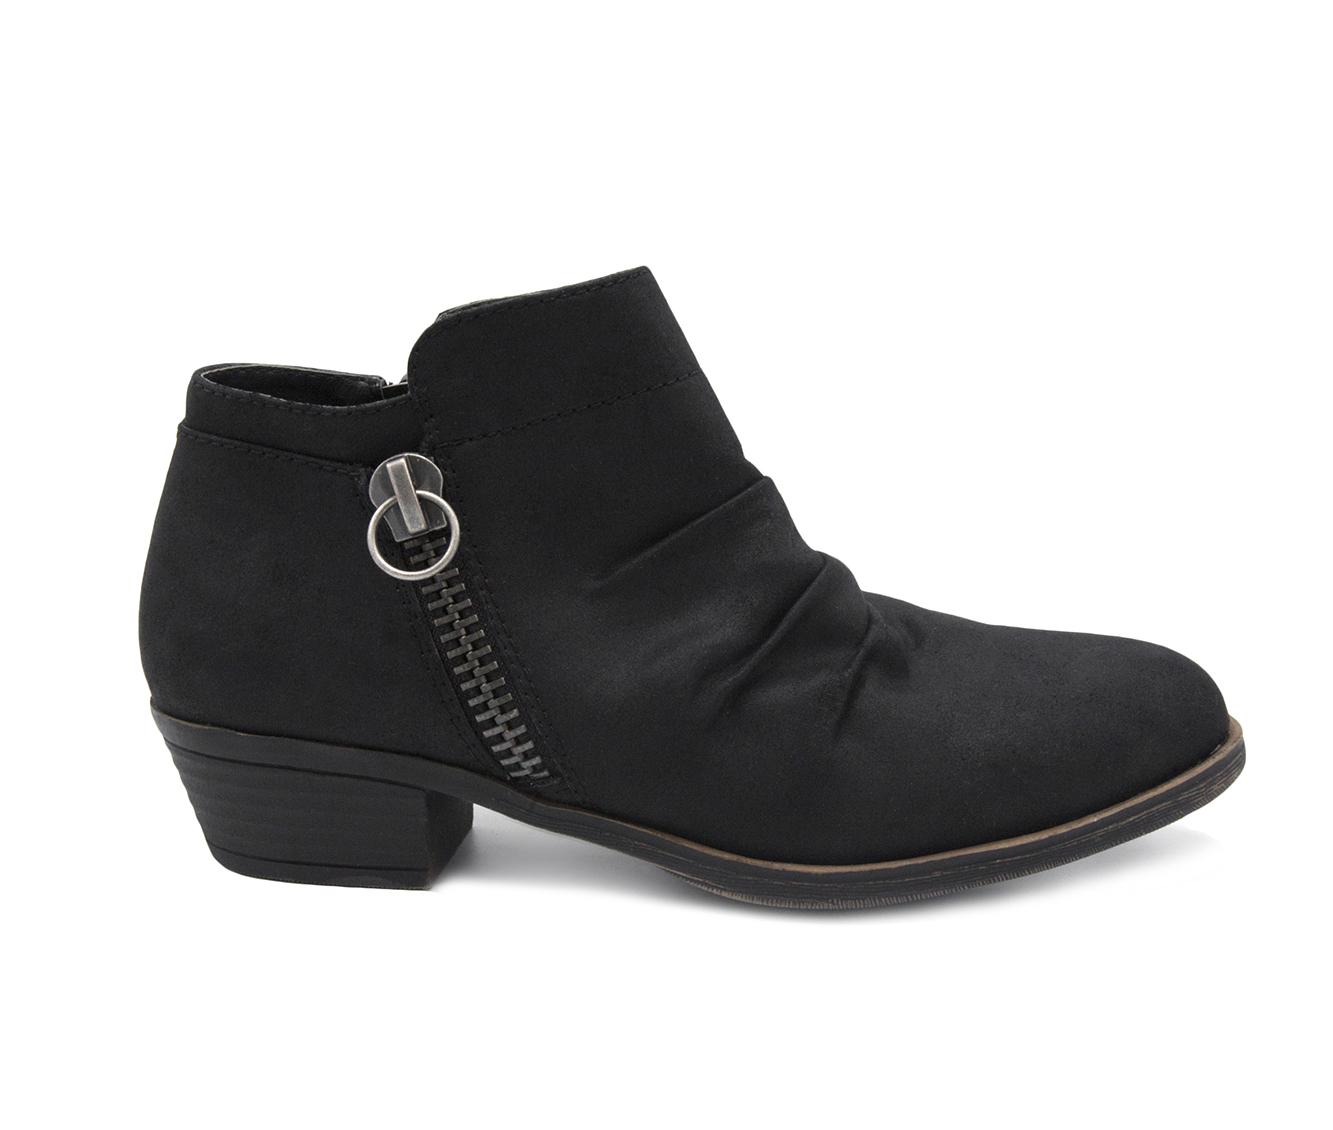 Sugar Trust Me Women's Boot (Black Canvas)